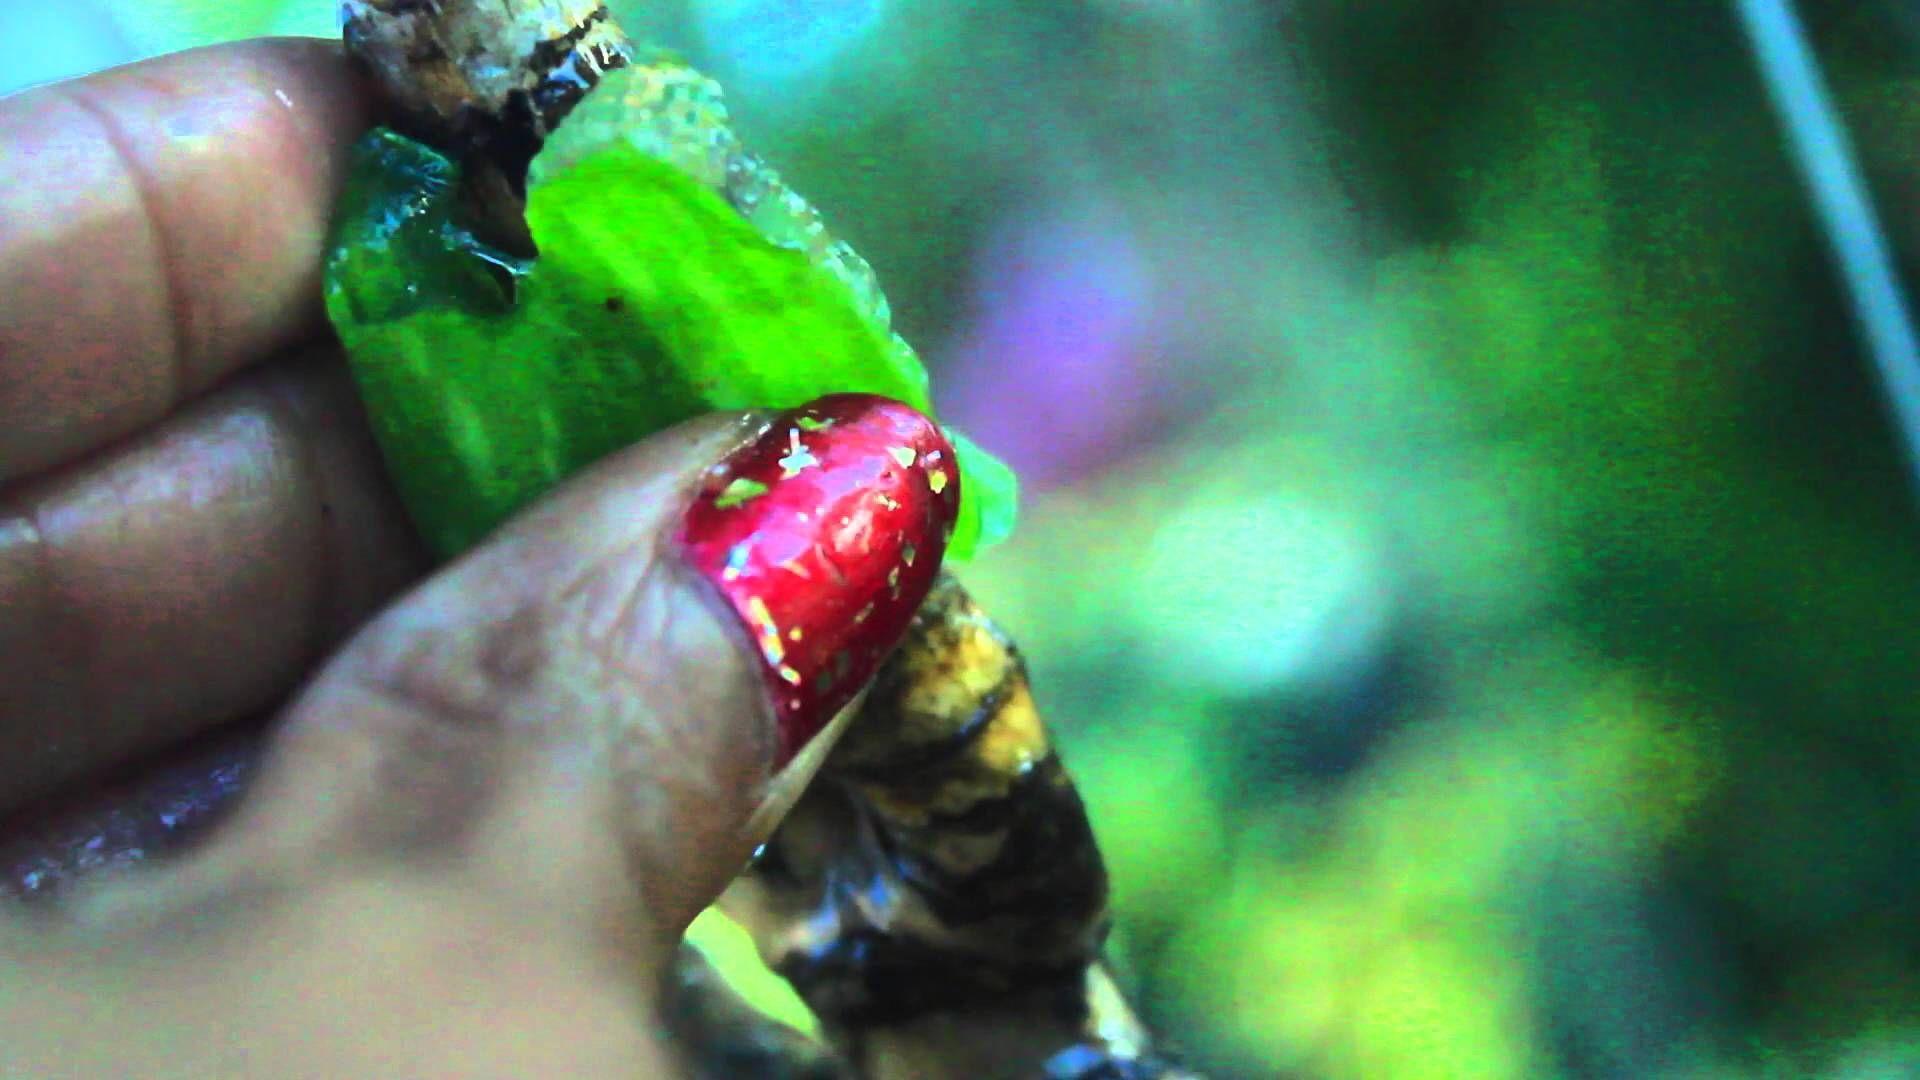 Orchid wrap u aloe vera treatment encourage new roots u keikis